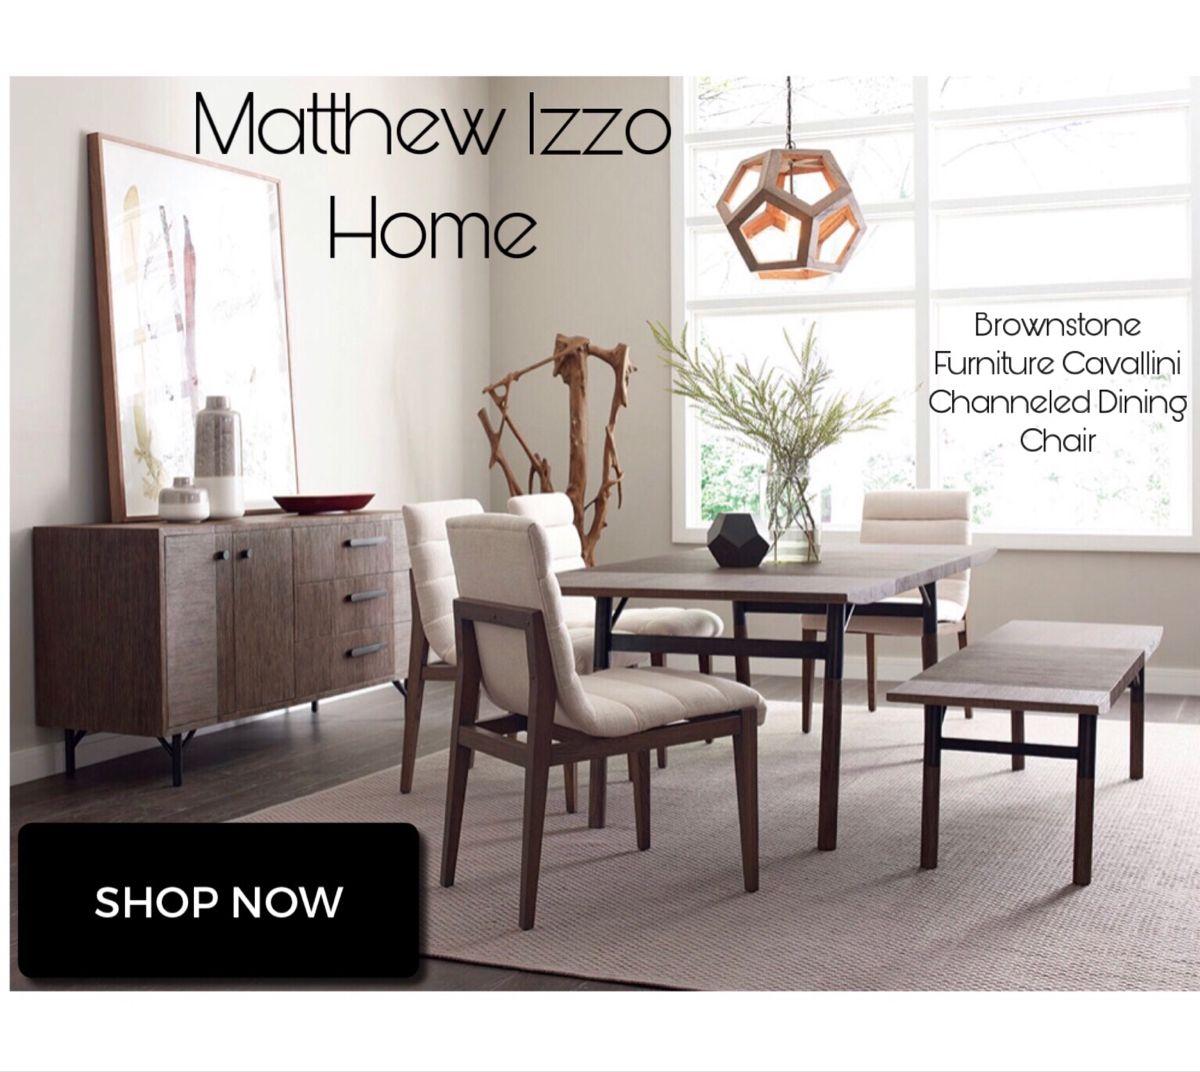 Brownstone Furniture Cavallini Channeled Chair In 2020 Furniture